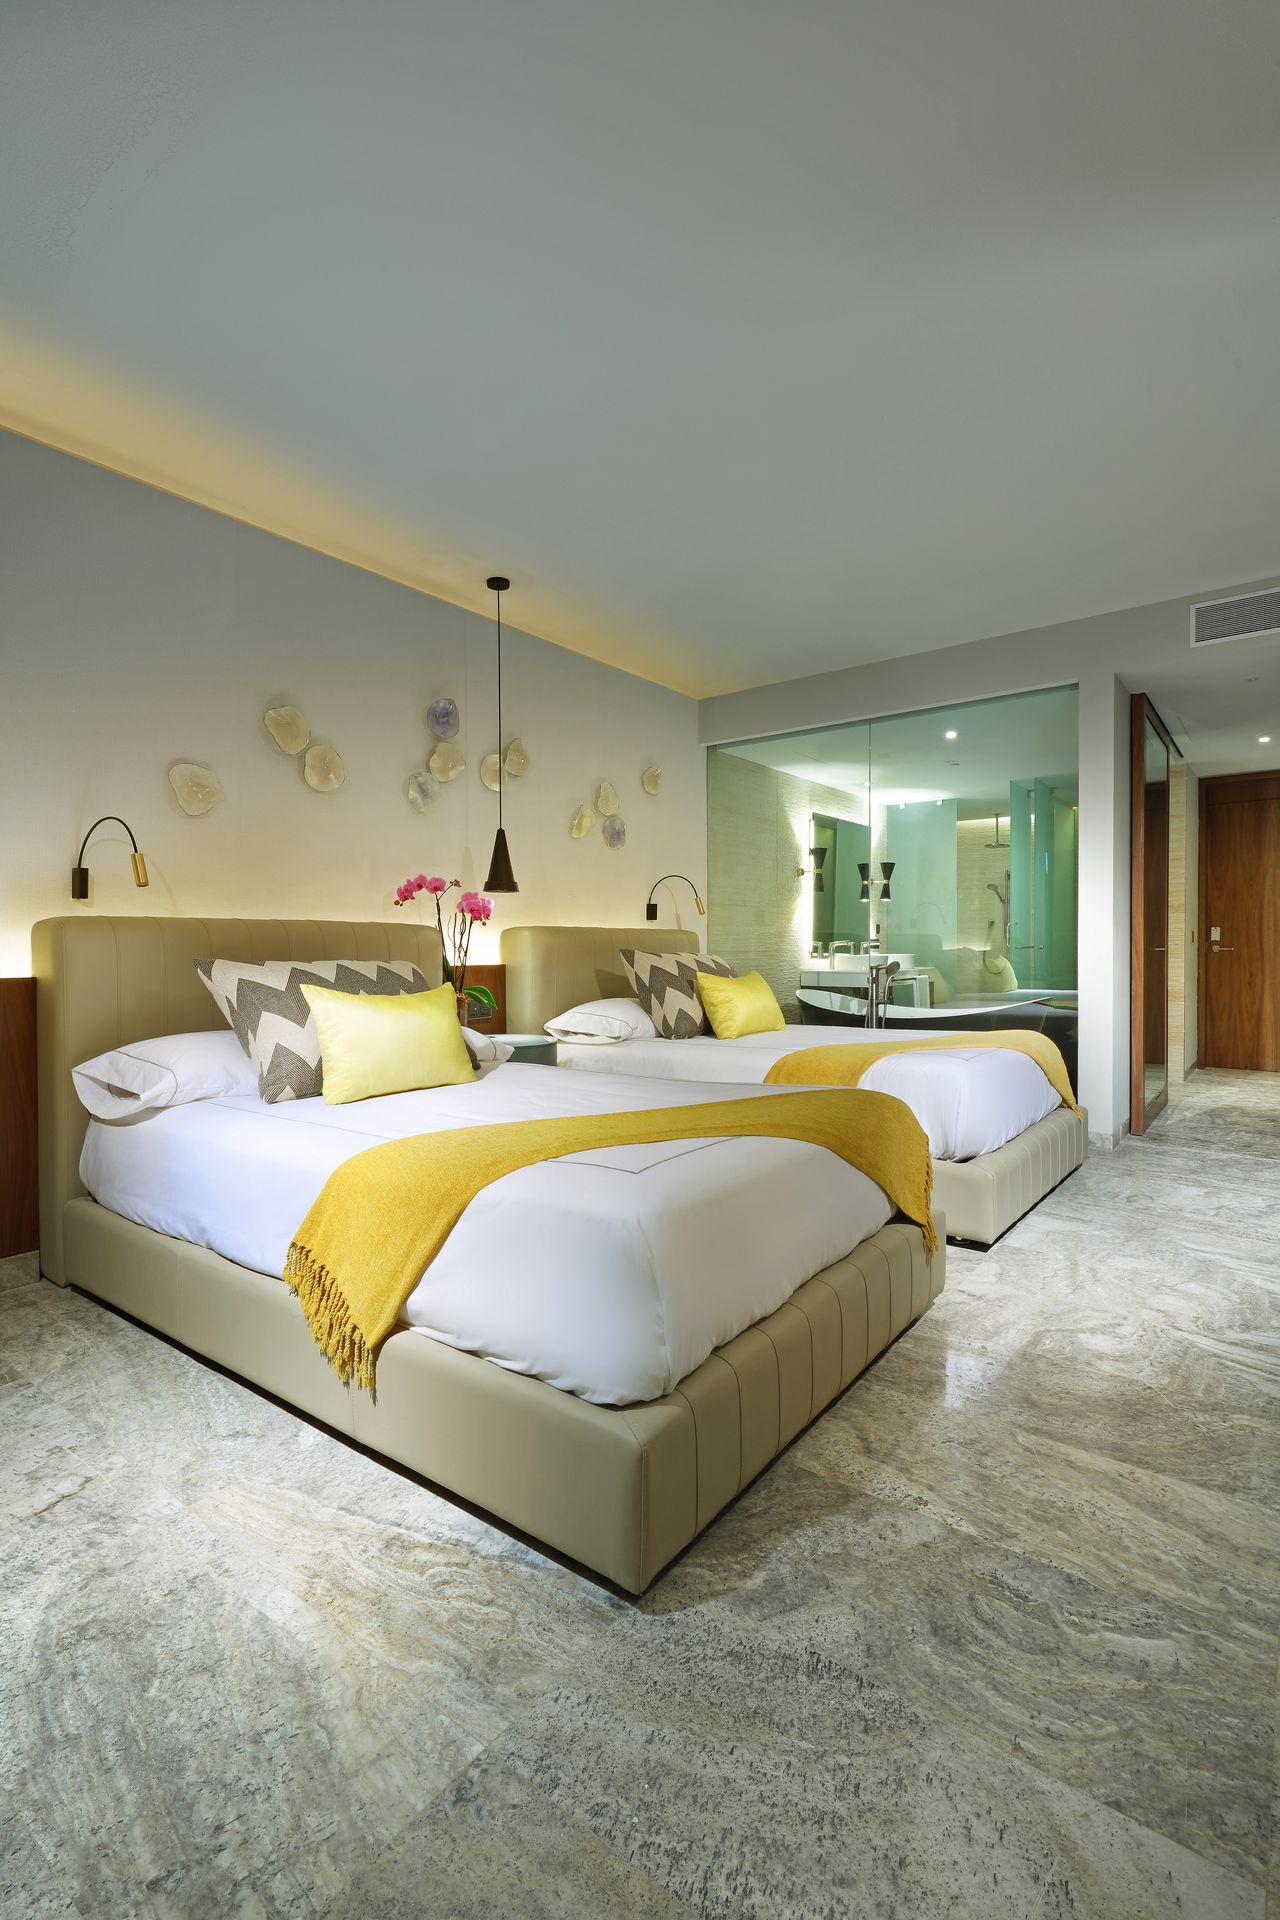 Offizielle Seite – Grand Palladium Costa Mujeres Resort & Spa